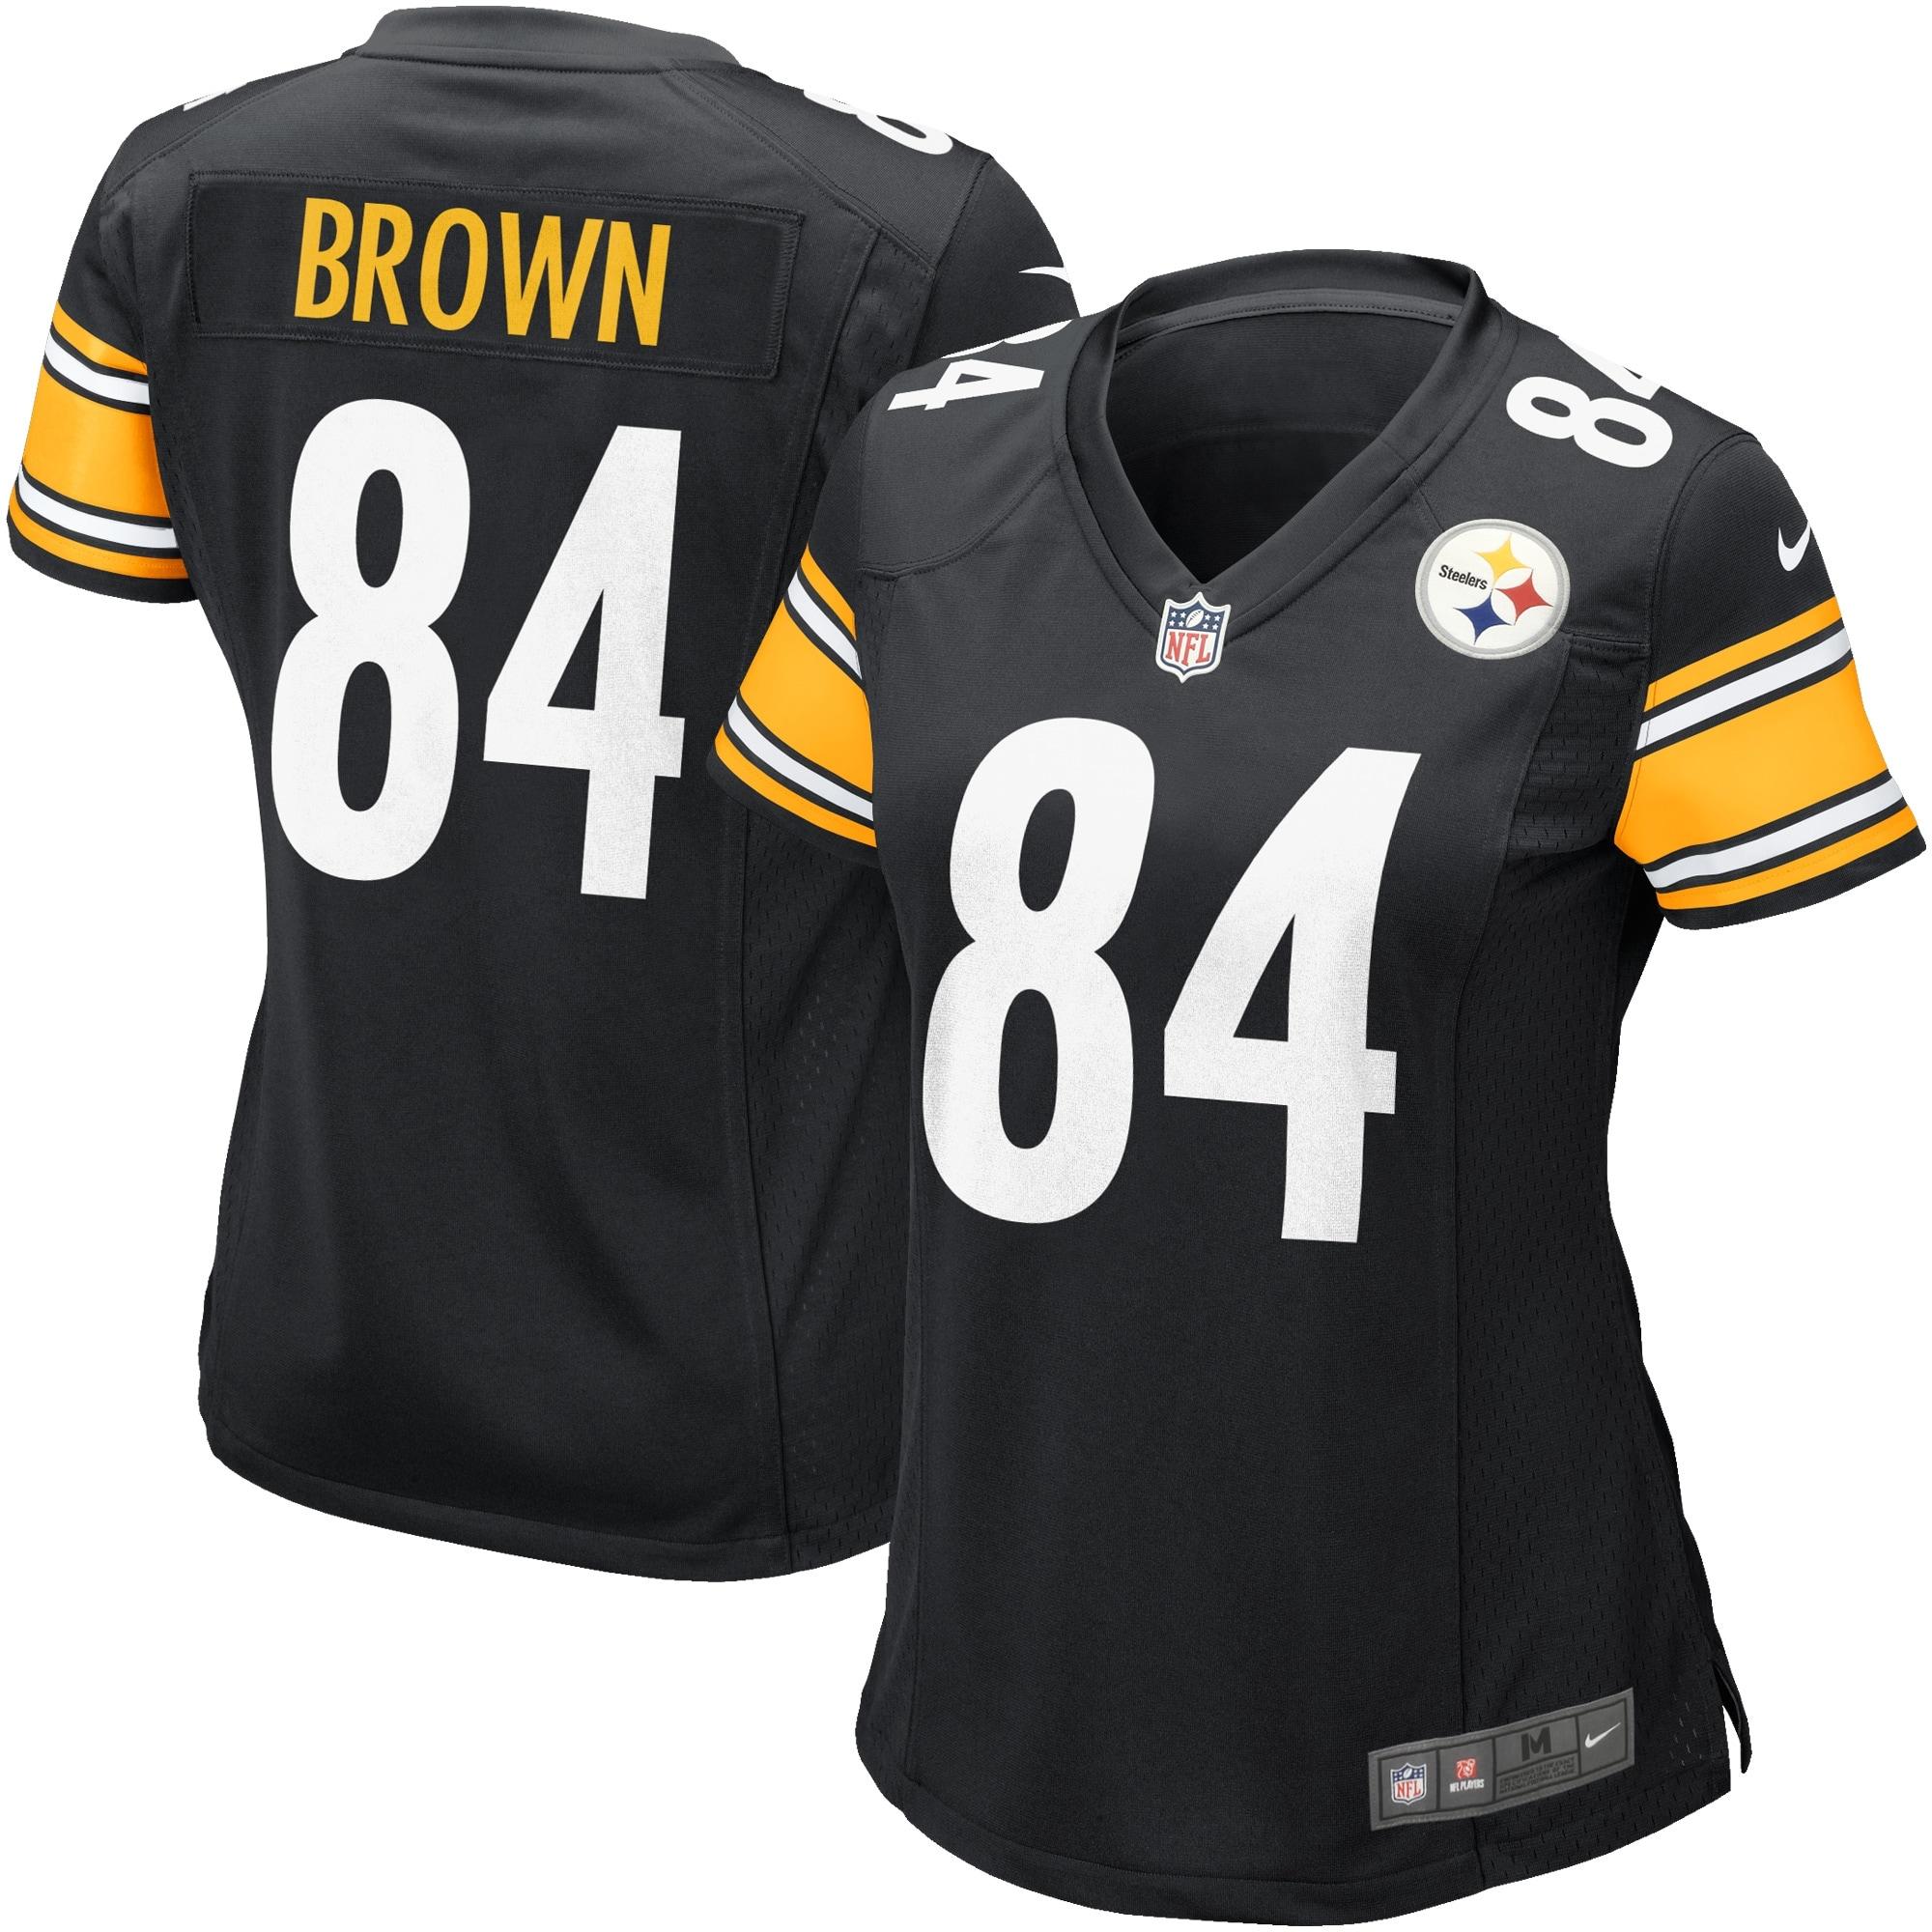 Antonio Brown Pittsburgh Steelers Nike Women's Game Jersey - Black